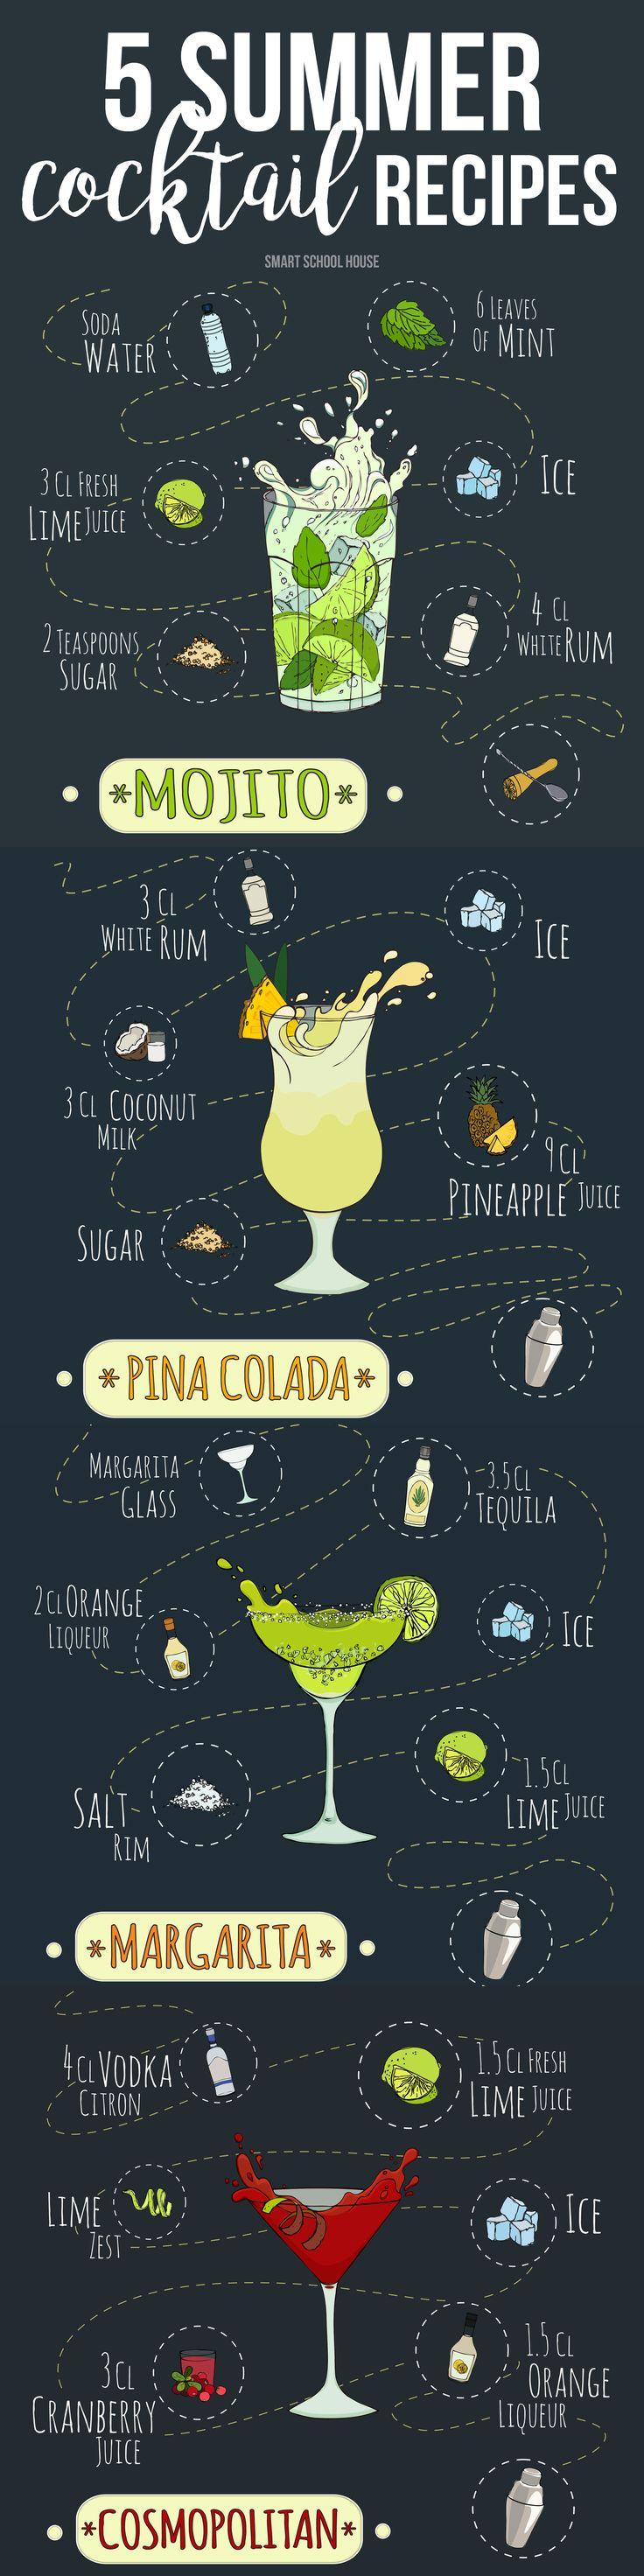 DIY Summer cocktail recipe ideas WITH fluid ounce (oz) conversions! Long island iced tea recipe, cosmopolitan recipe, margarita recipe, pina colada recipe, mojito recipe ideas.